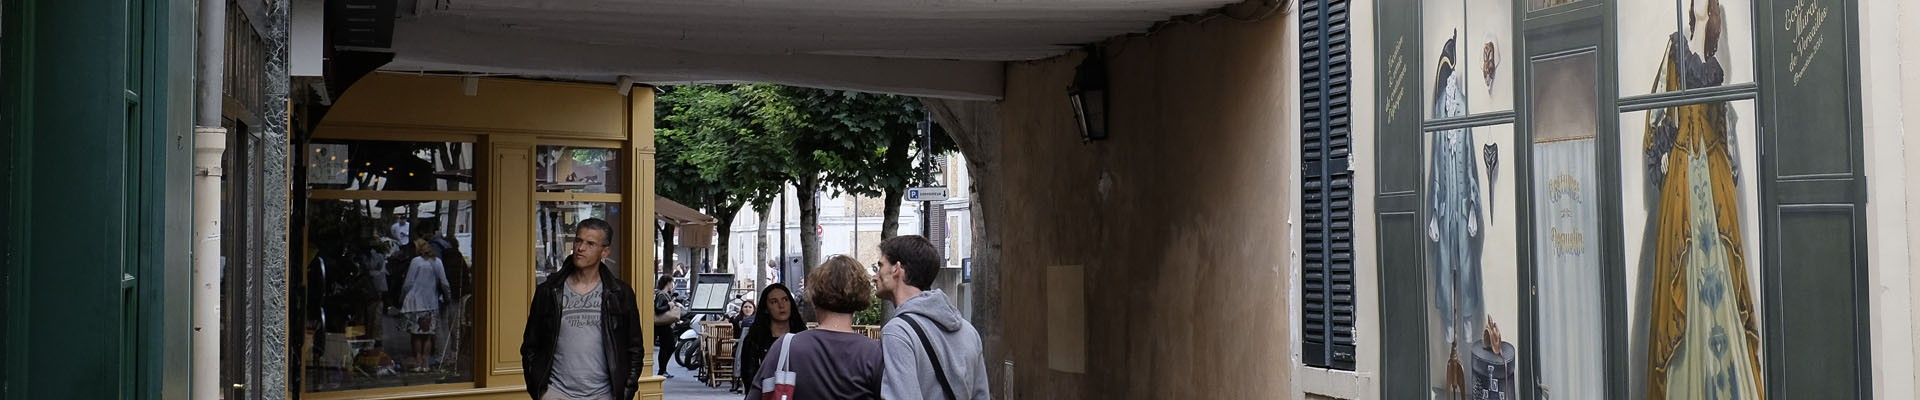 Explorar Versalles